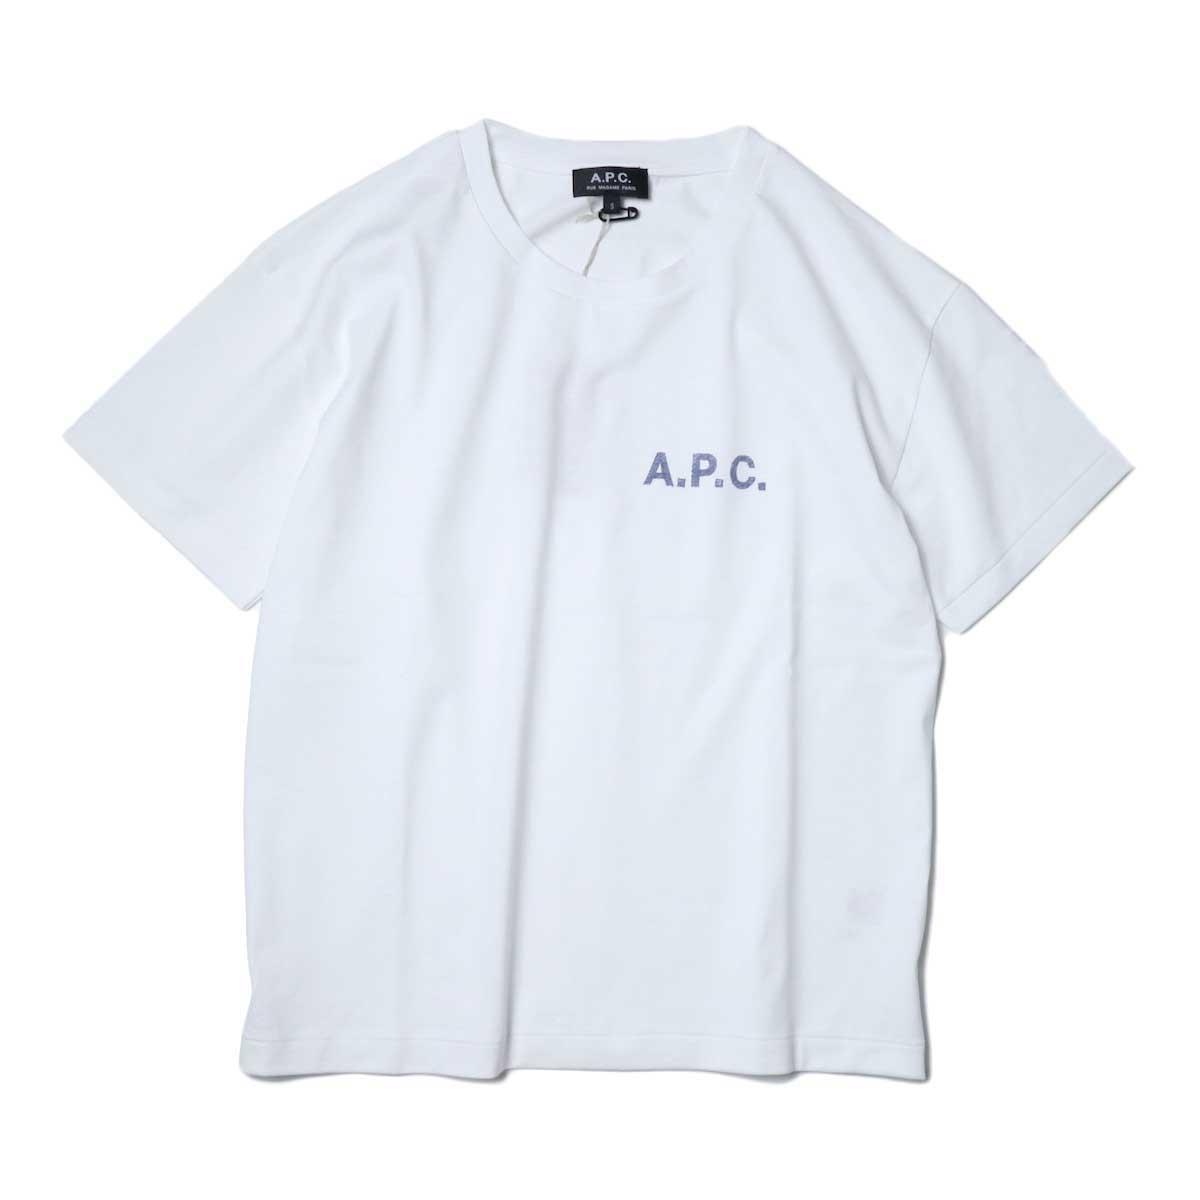 A.P.C. / Judy Tシャツ (White) 正面